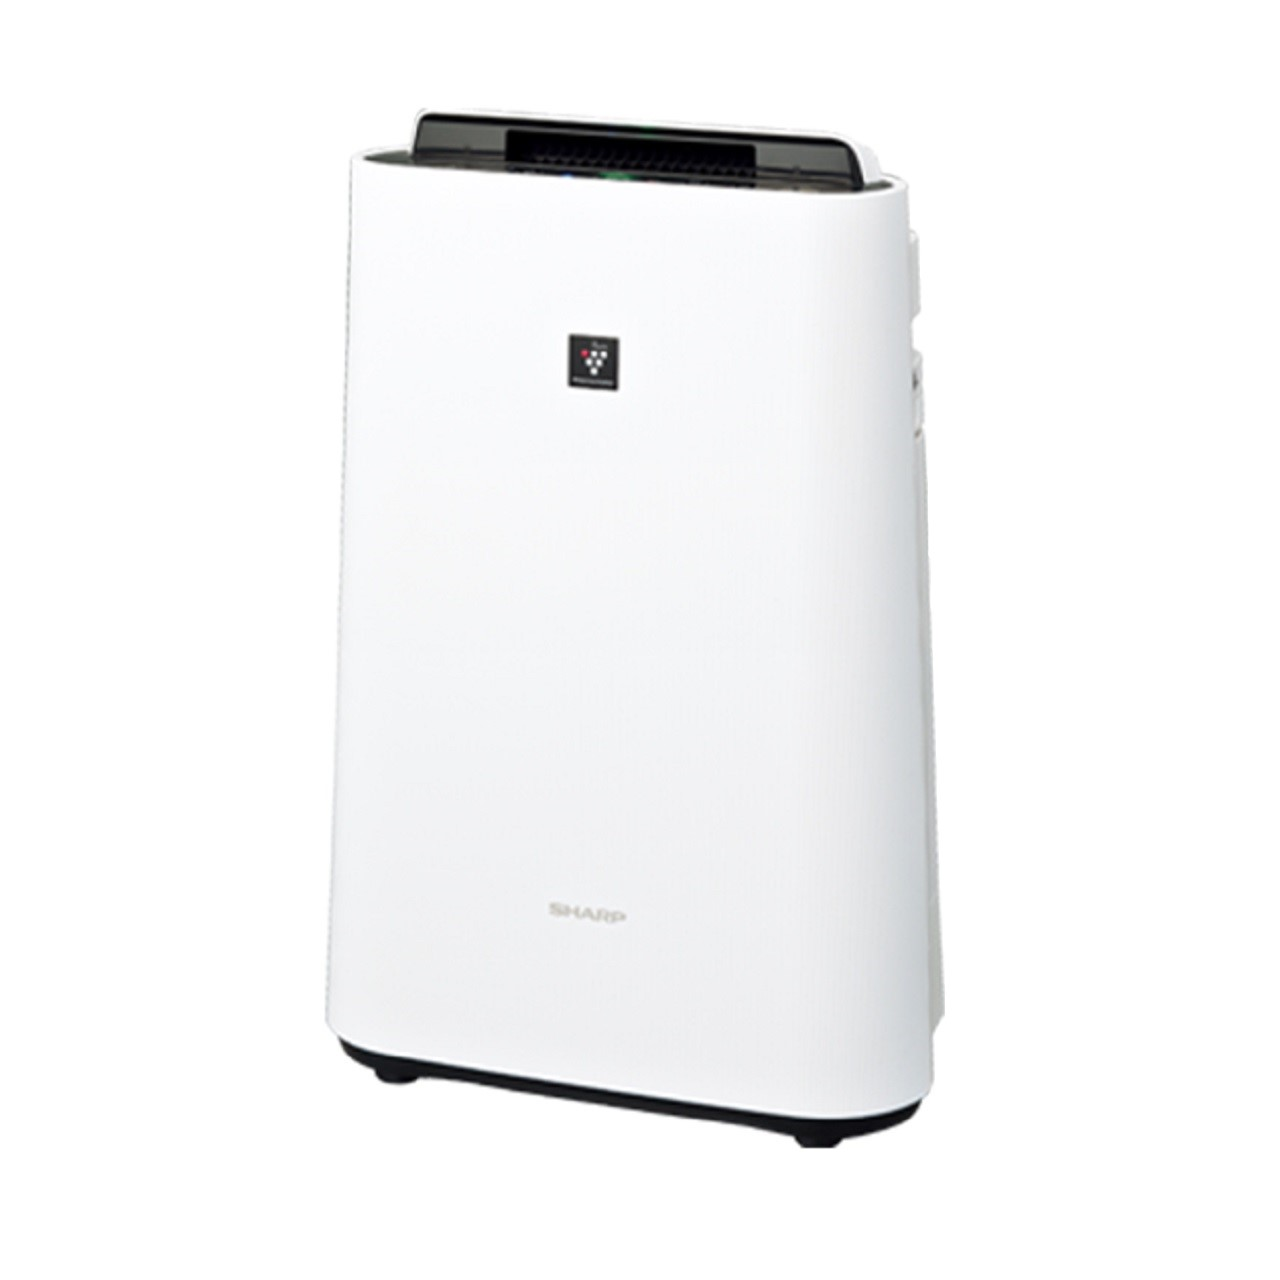 シャープKC-L50加湿空気清浄機